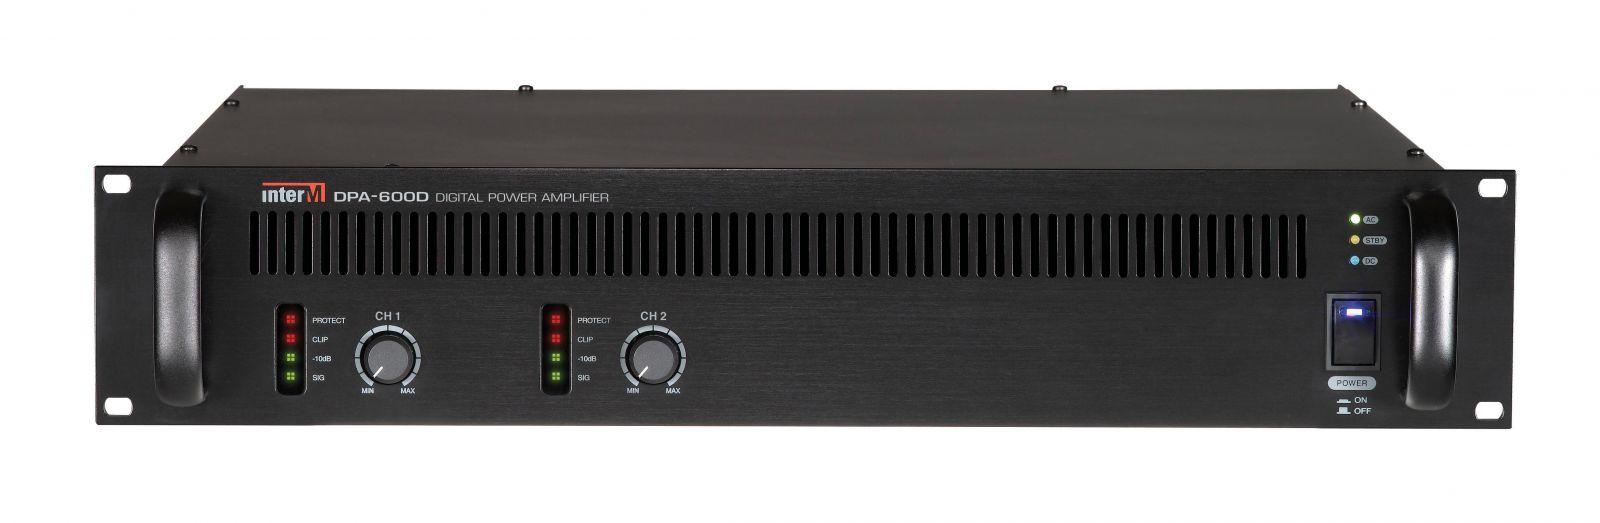 Amply 600Wx2CH Inter-M, DPA-600D